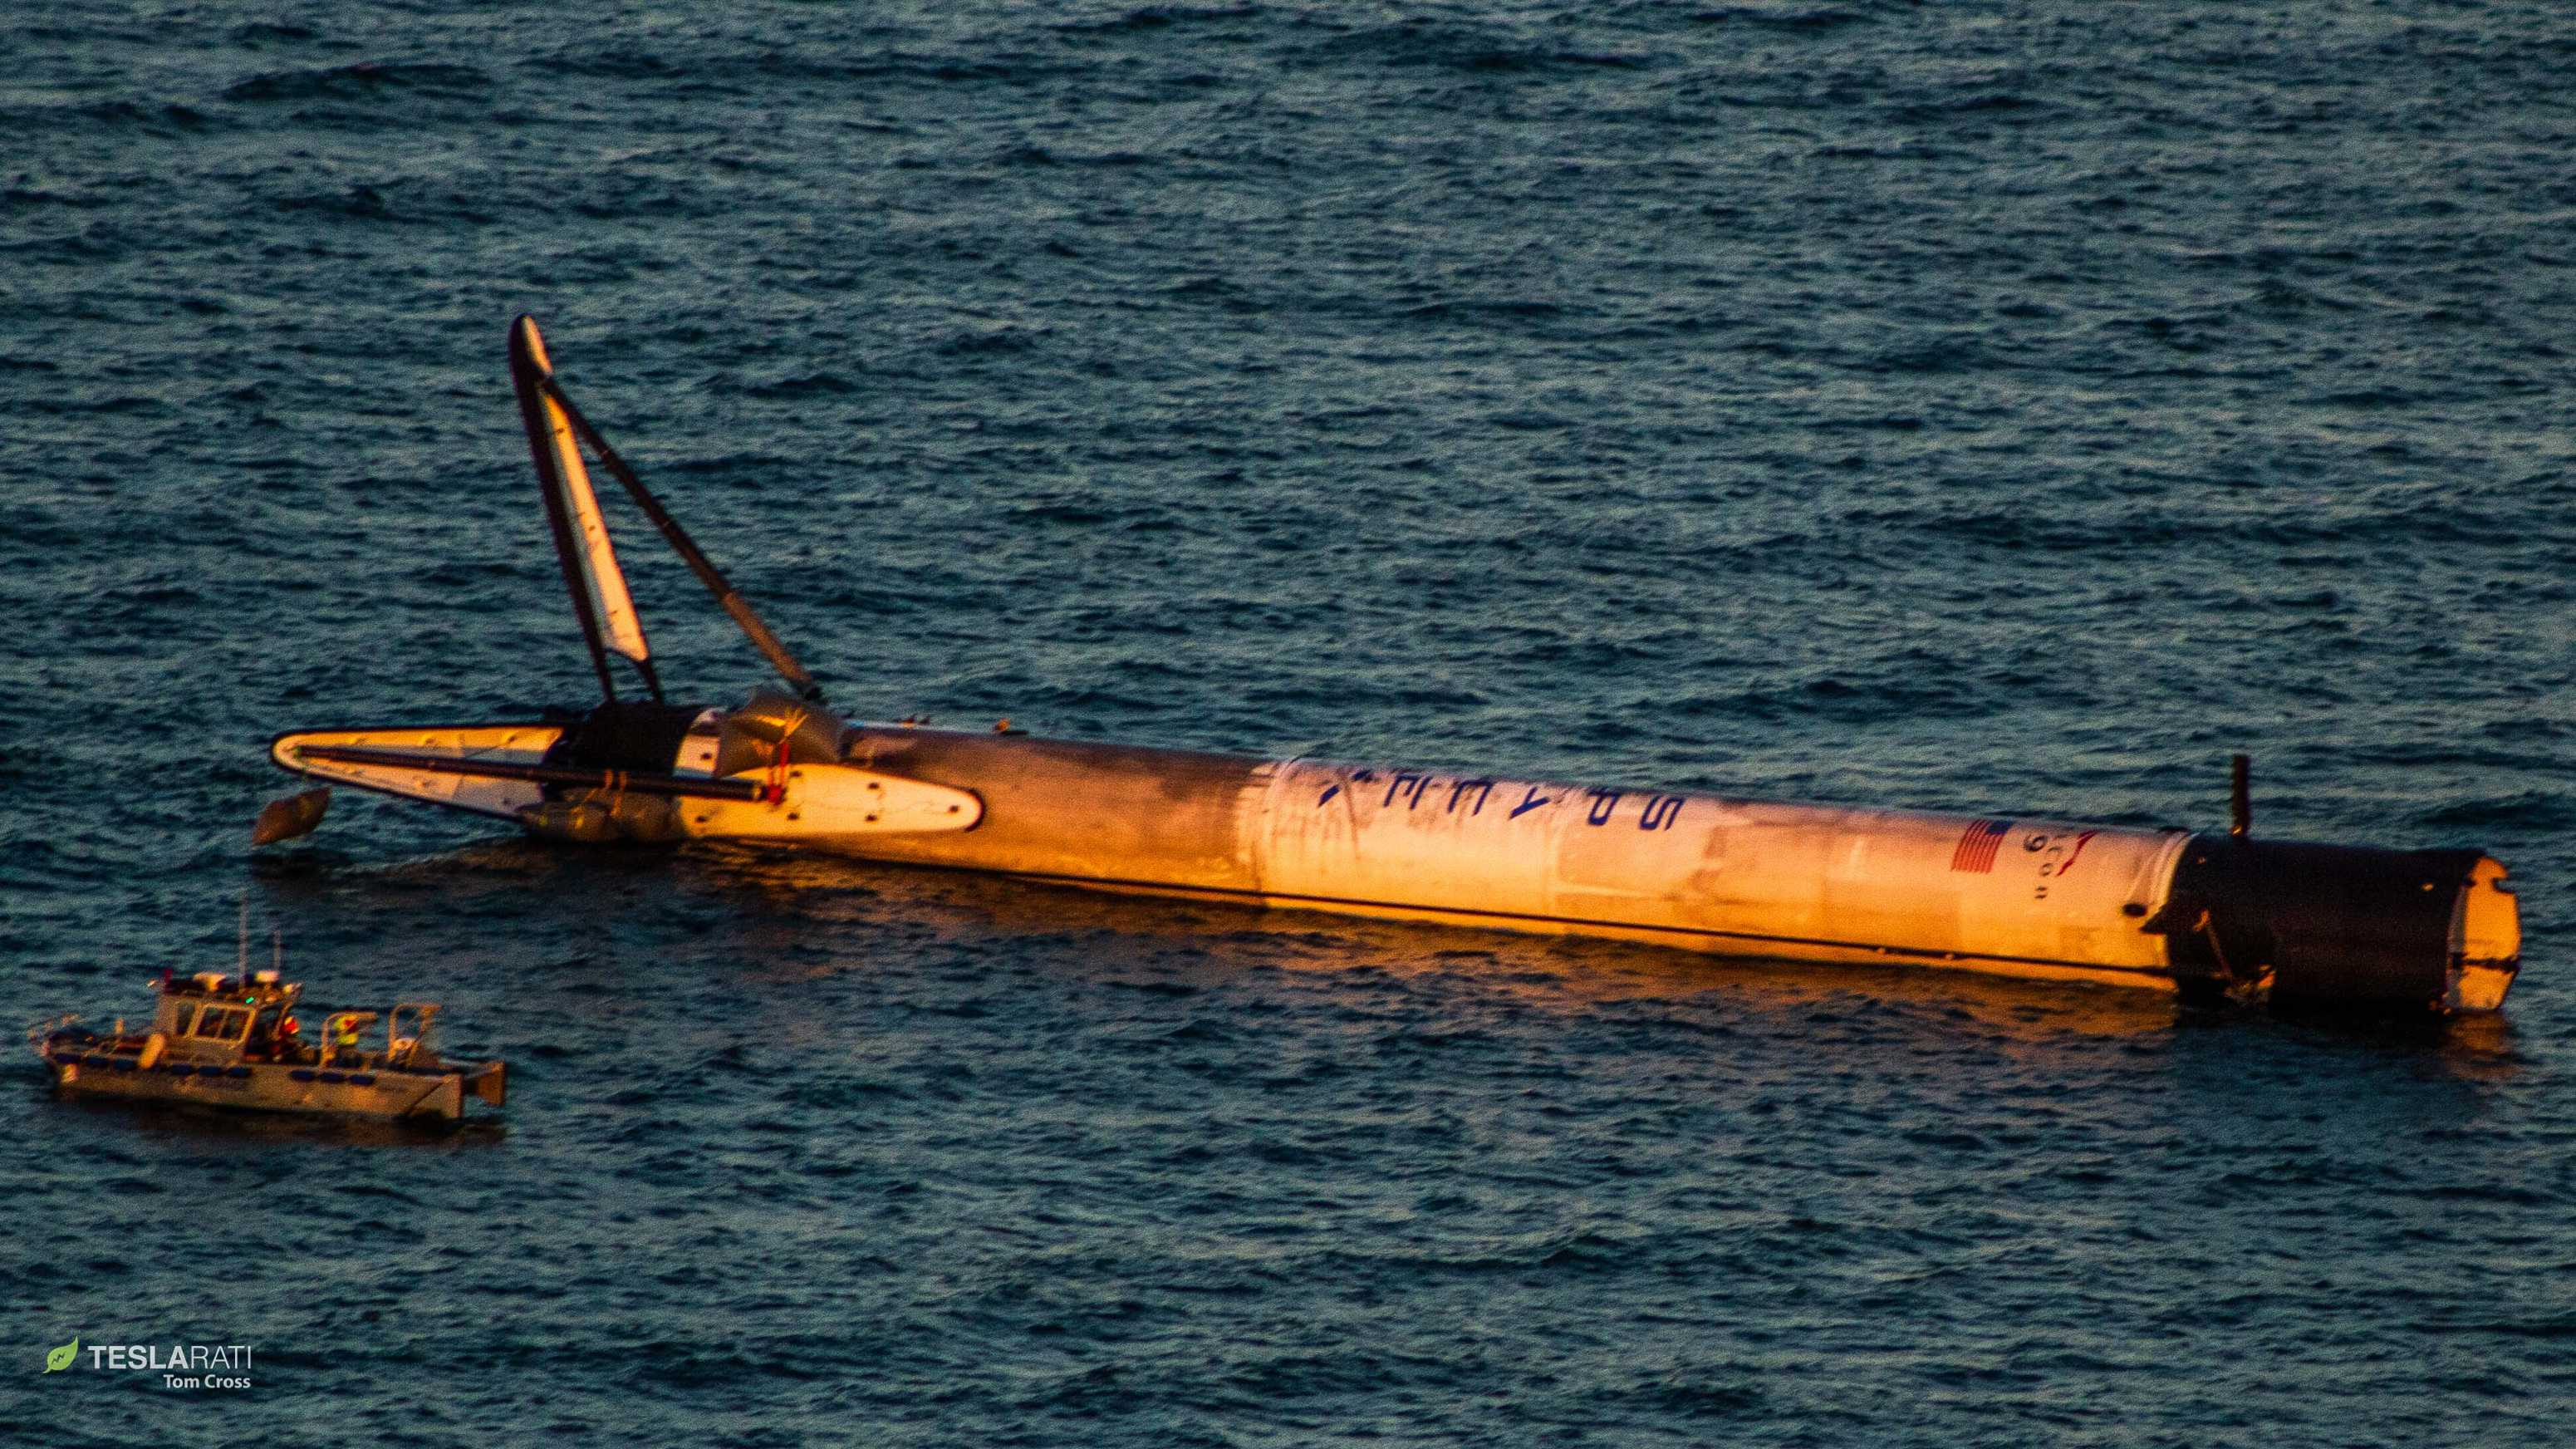 Falcon 9 B1050 at sea 120618 (Tom Cross) overview 2(c)